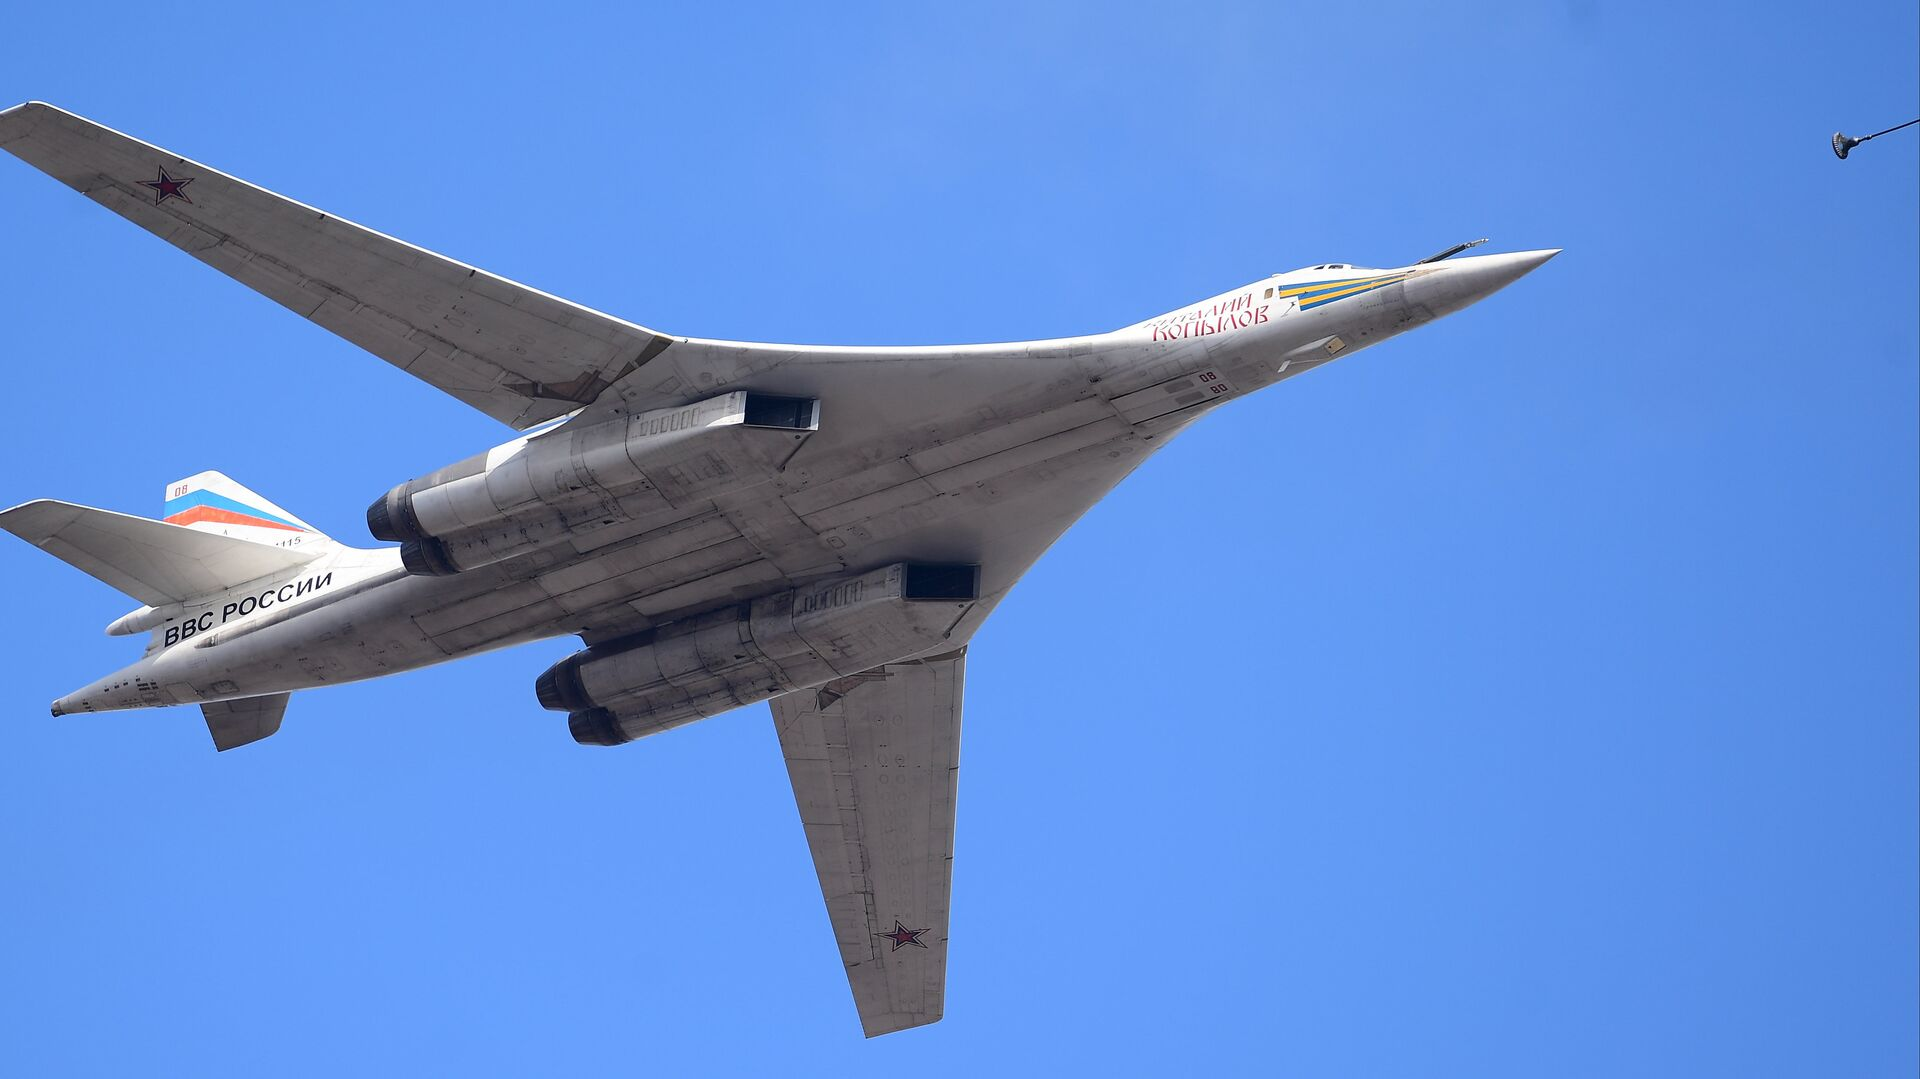 Bombardero estratégico Tu-160 - Sputnik Mundo, 1920, 20.04.2021